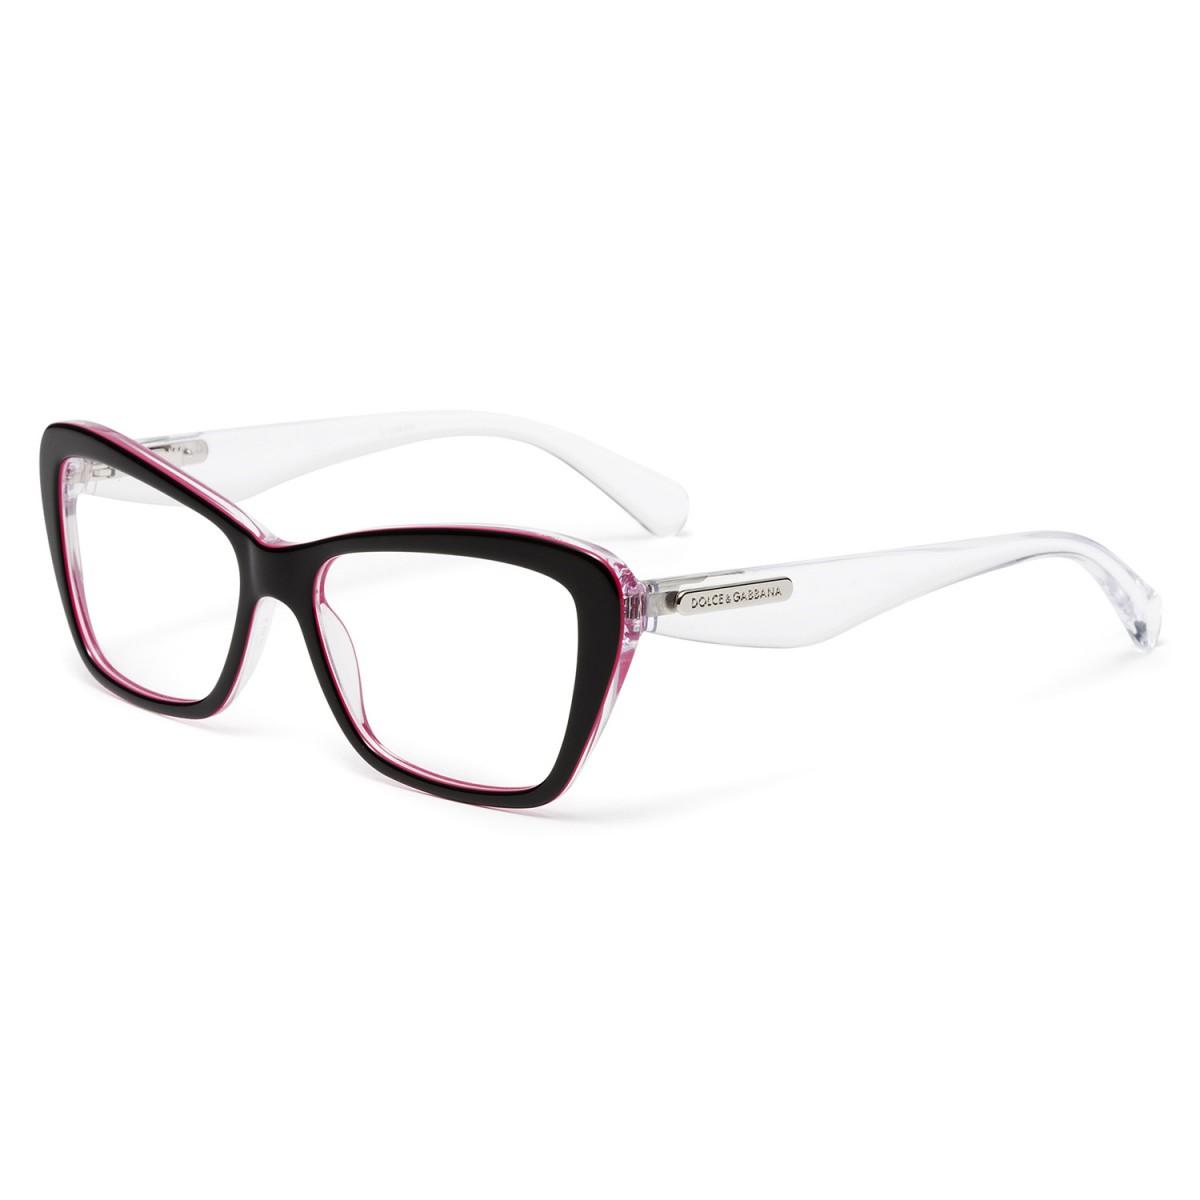 e4295ee8115e7 Óculos de Grau Dolce   Gabbana DG3194 2794